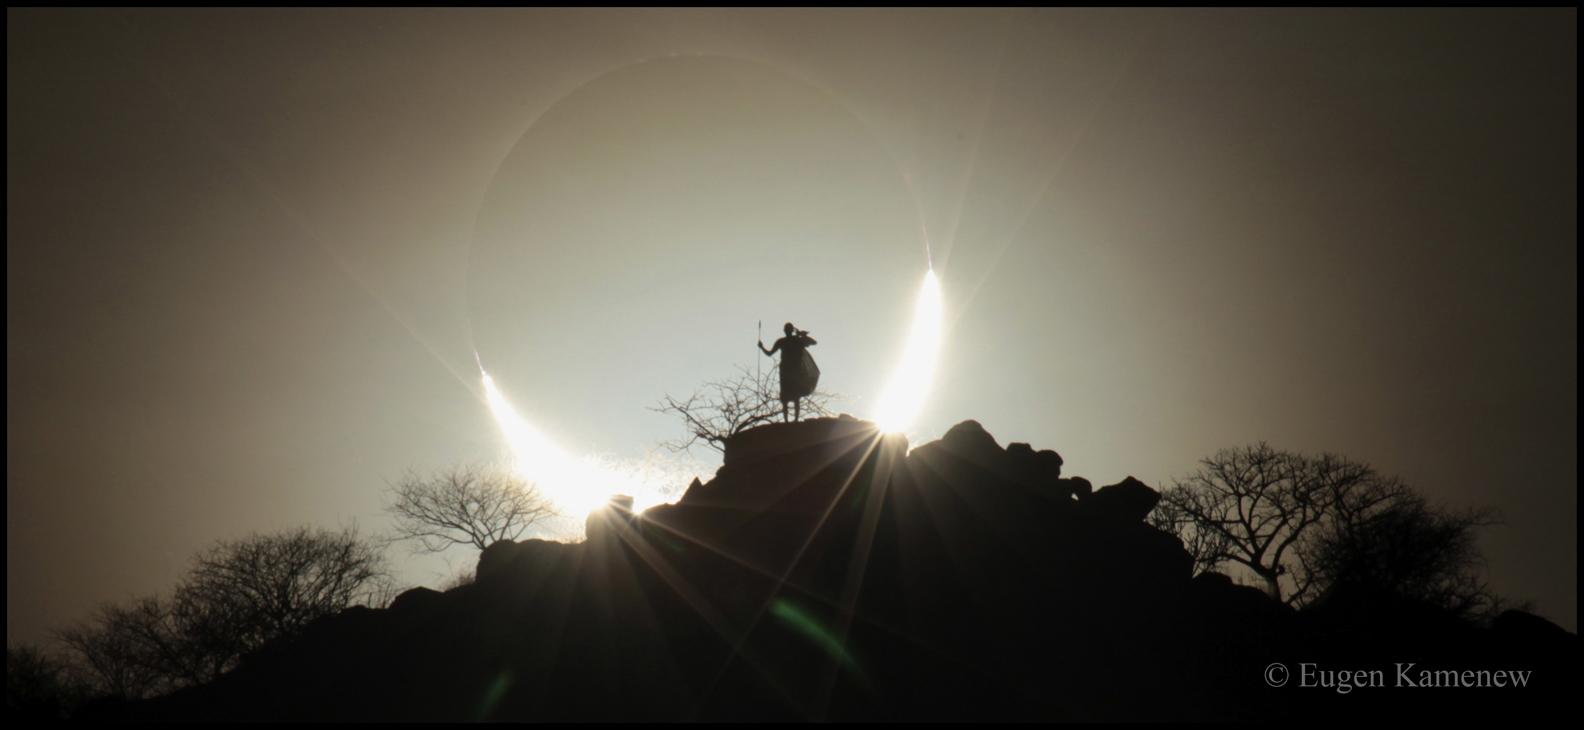 Kenya solar eclipse version 2